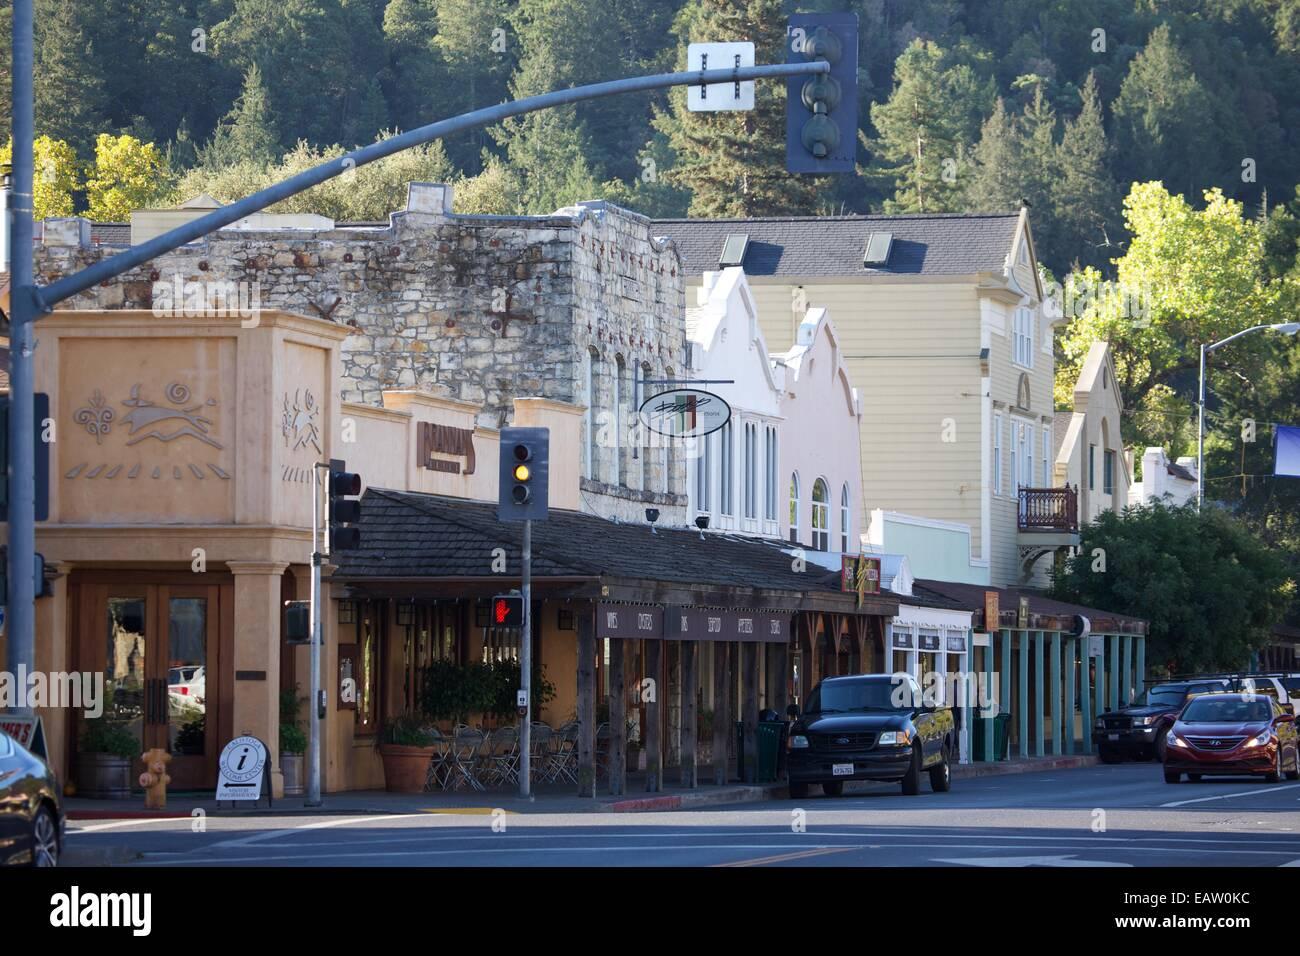 Downtown Calistoga California Home To Restaurants